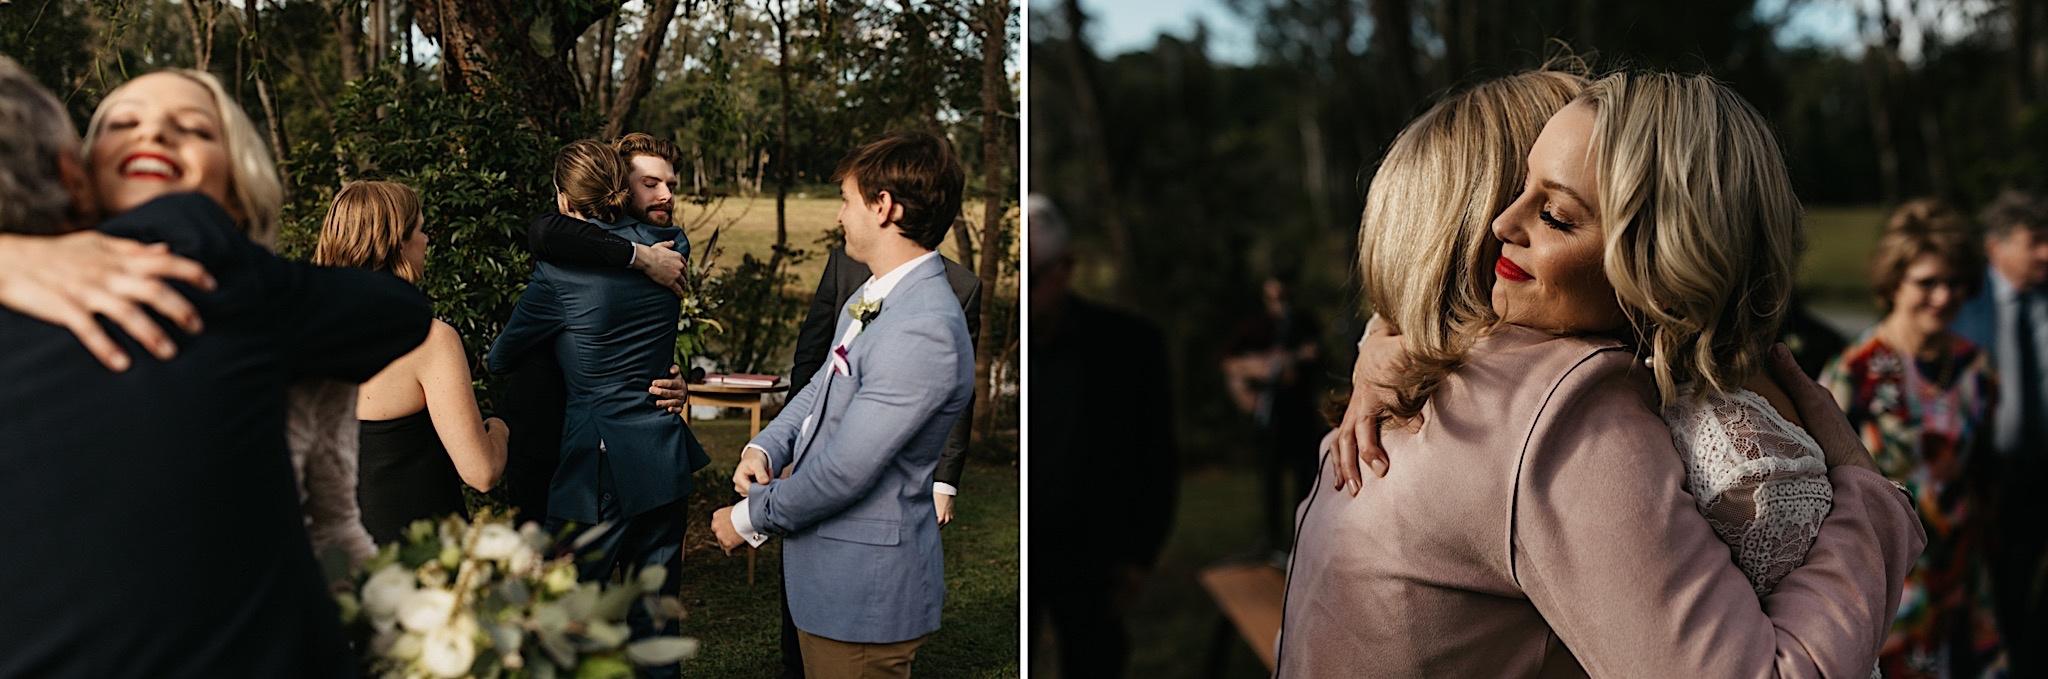 052_SBA-Jen-Tom-Wedding-175_SBA-Jen-Tom-Wedding-174.jpg